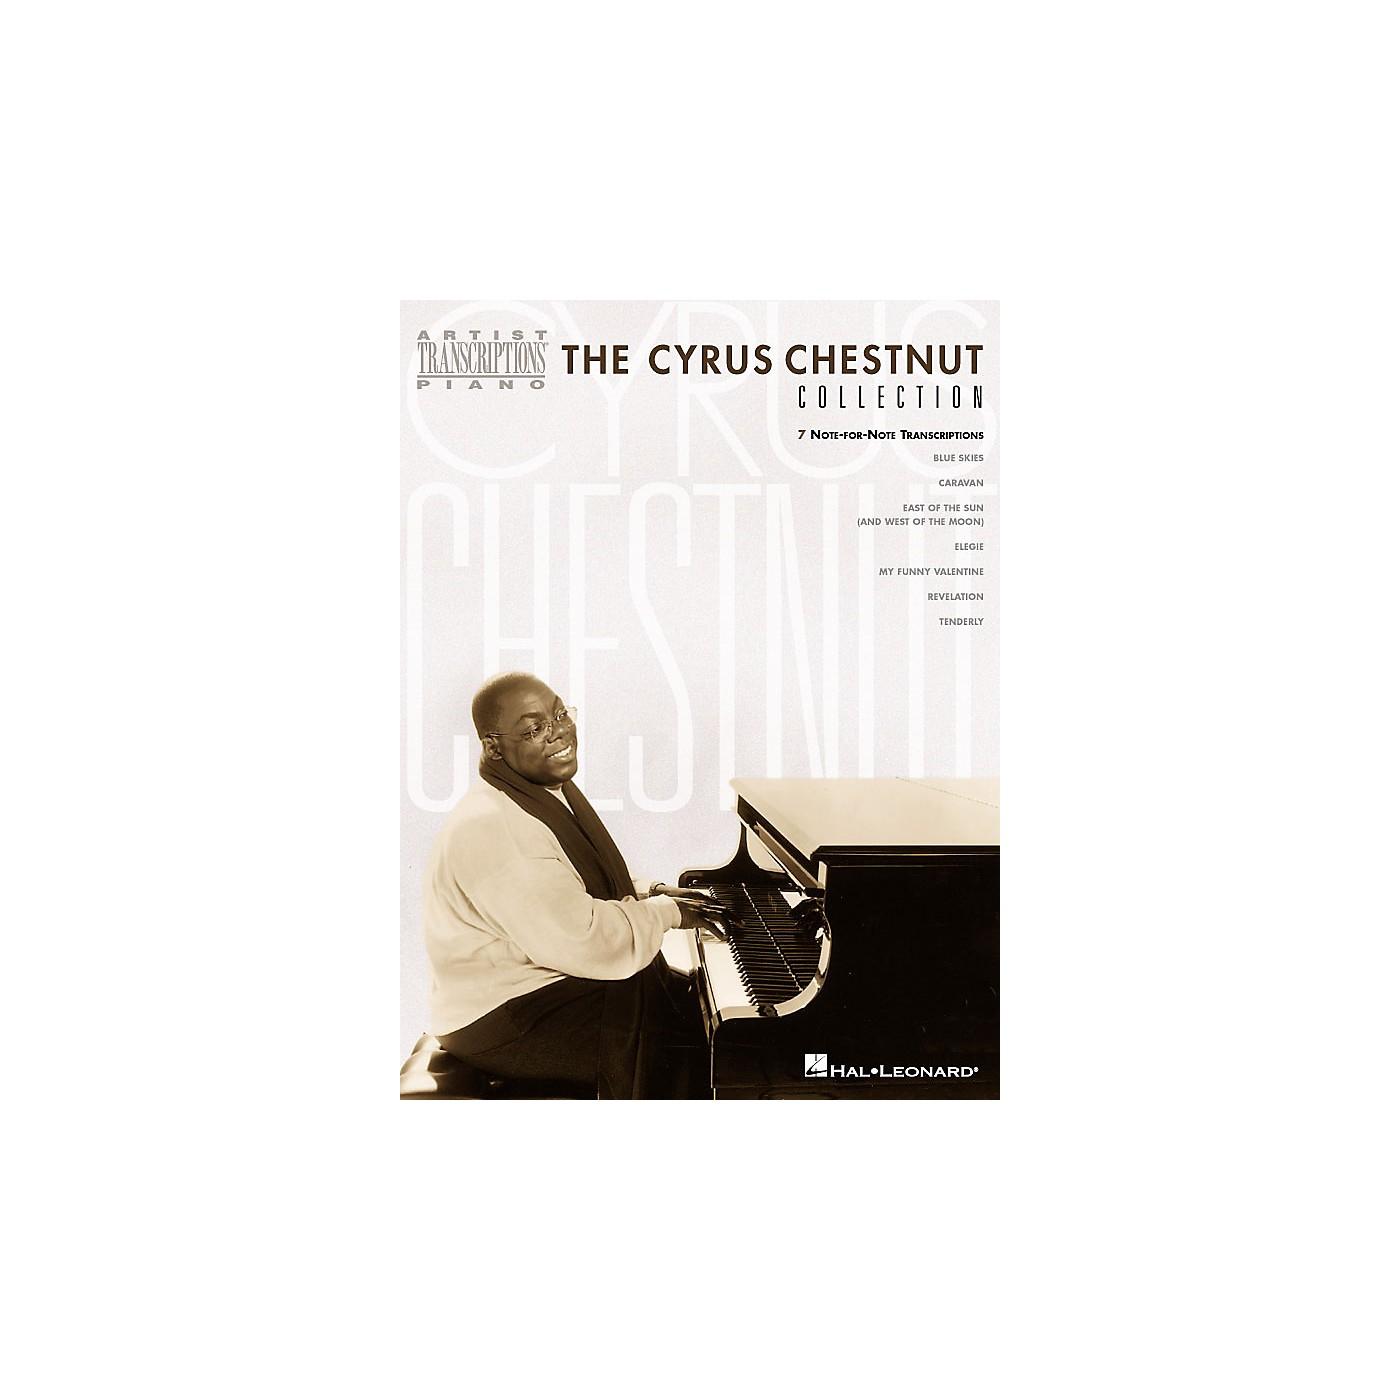 Hal Leonard The Cyrus Chestnut Collection Artist Transcriptions Series by Cyrus Chestnut (Advanced) thumbnail